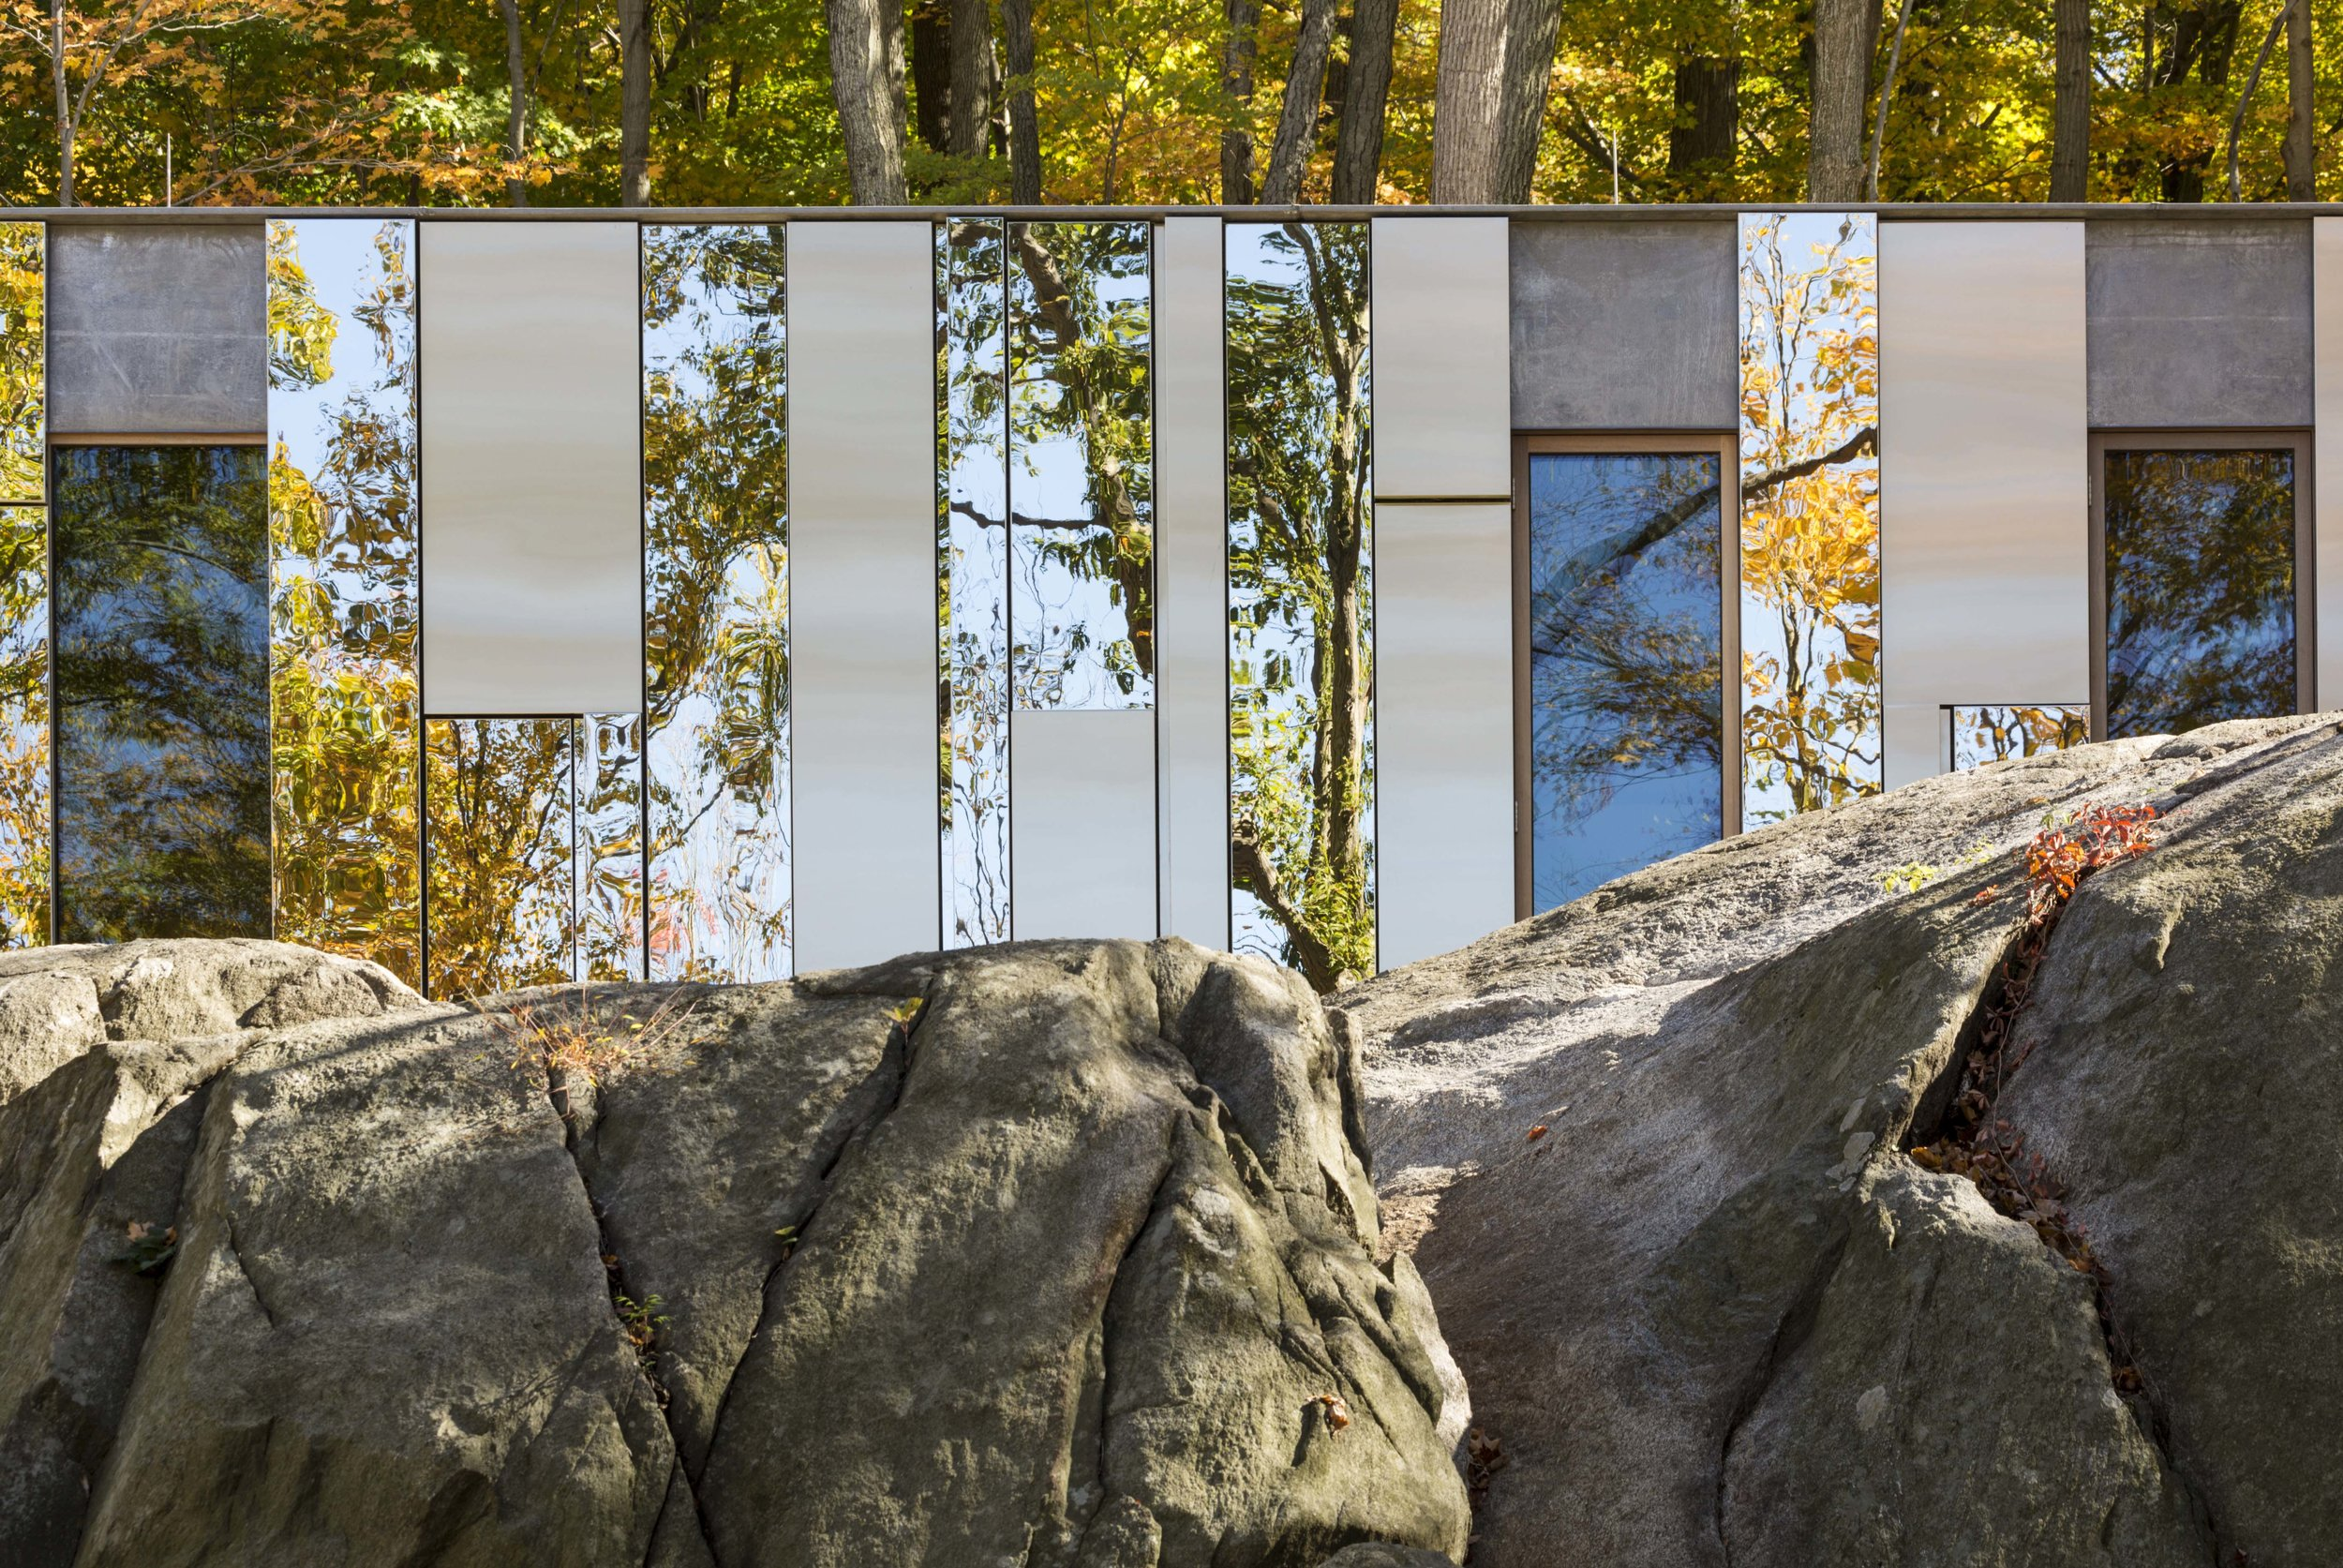 architectural record - Record Houses: Pound Ridge House by KieranTimberlake, April 2015